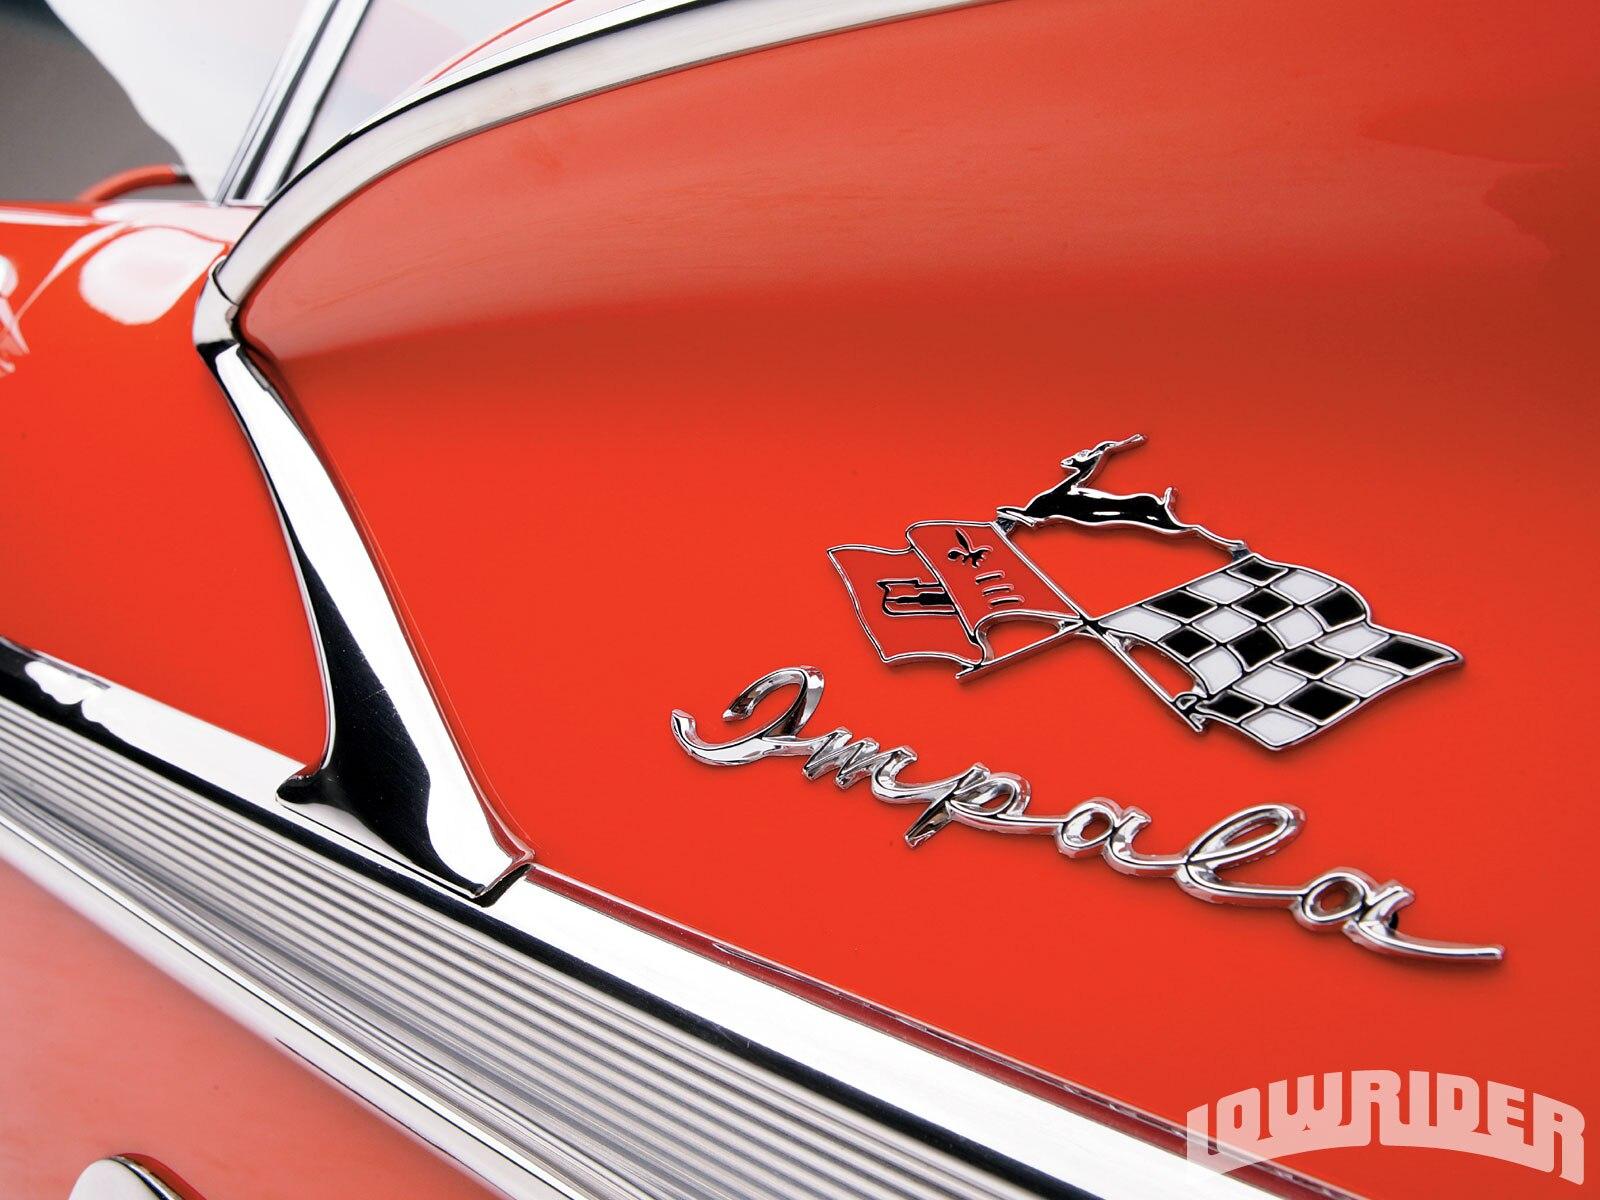 1958 chevrolet impala convertible chevy 348 tri power engine 915 buycottarizona Images